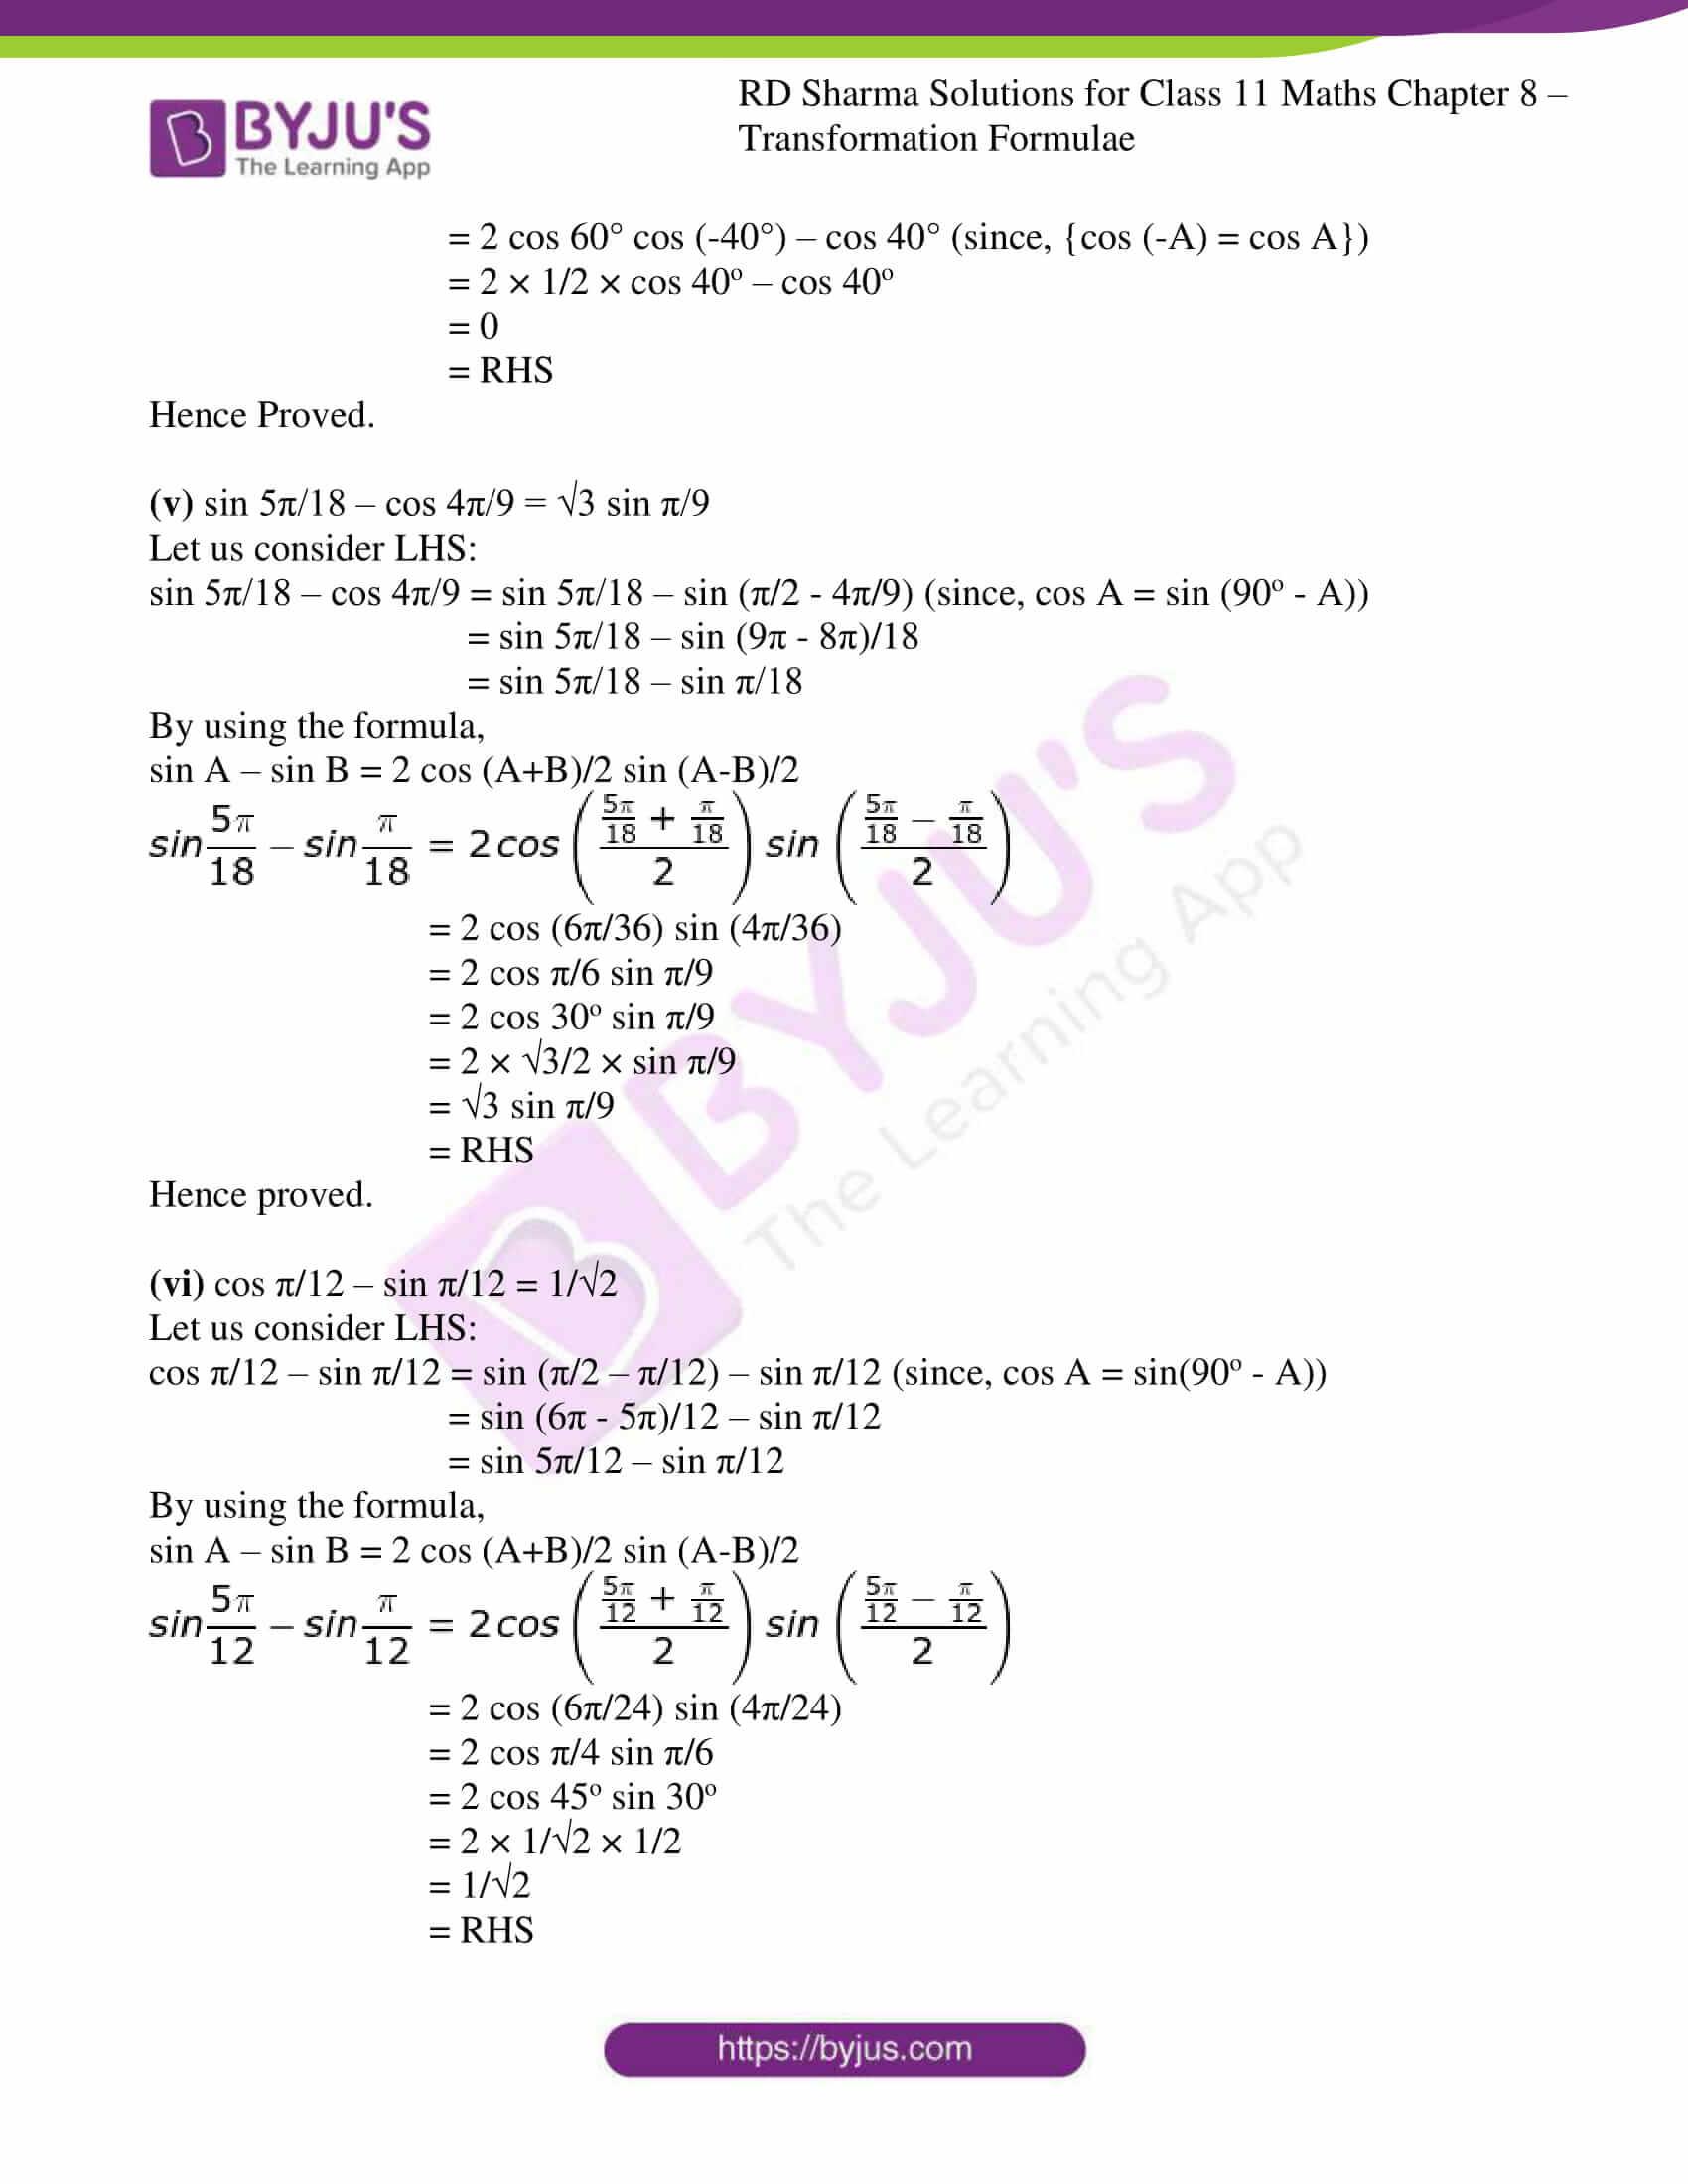 rd sharma class 11 maths ch 8 ex 2 06